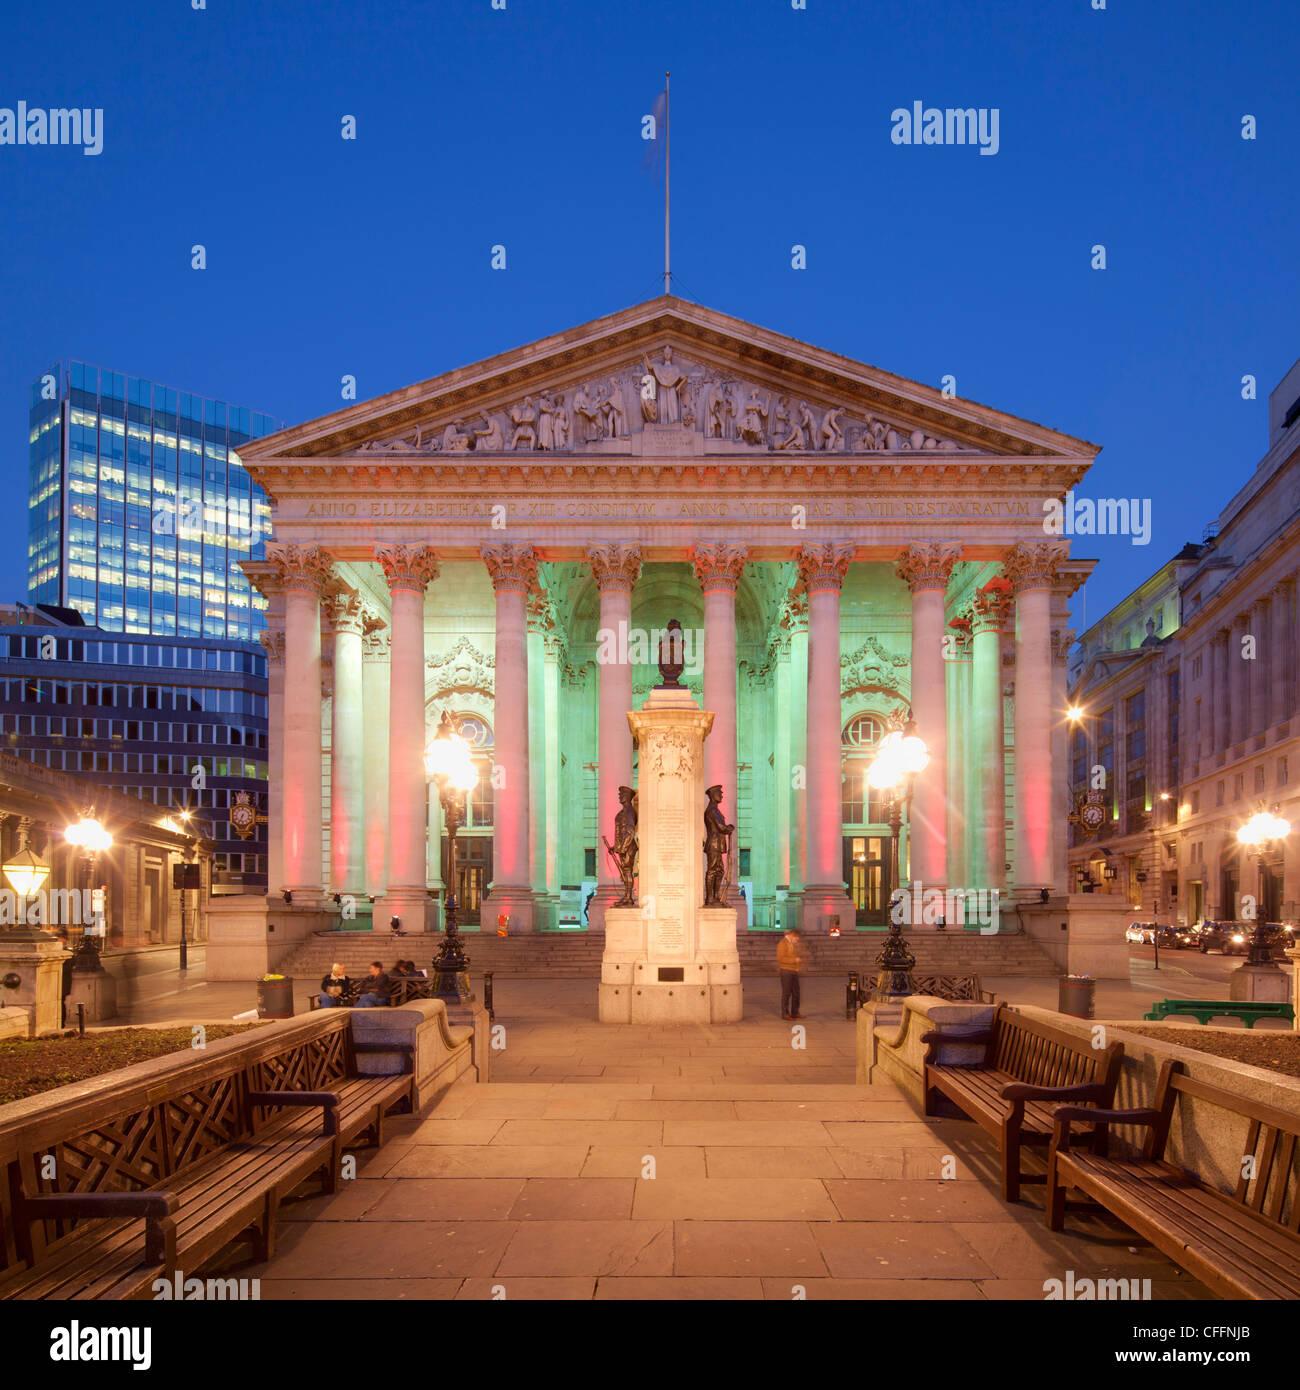 1f9134ea2 Royal Exchange London Stock Photos & Royal Exchange London Stock ...